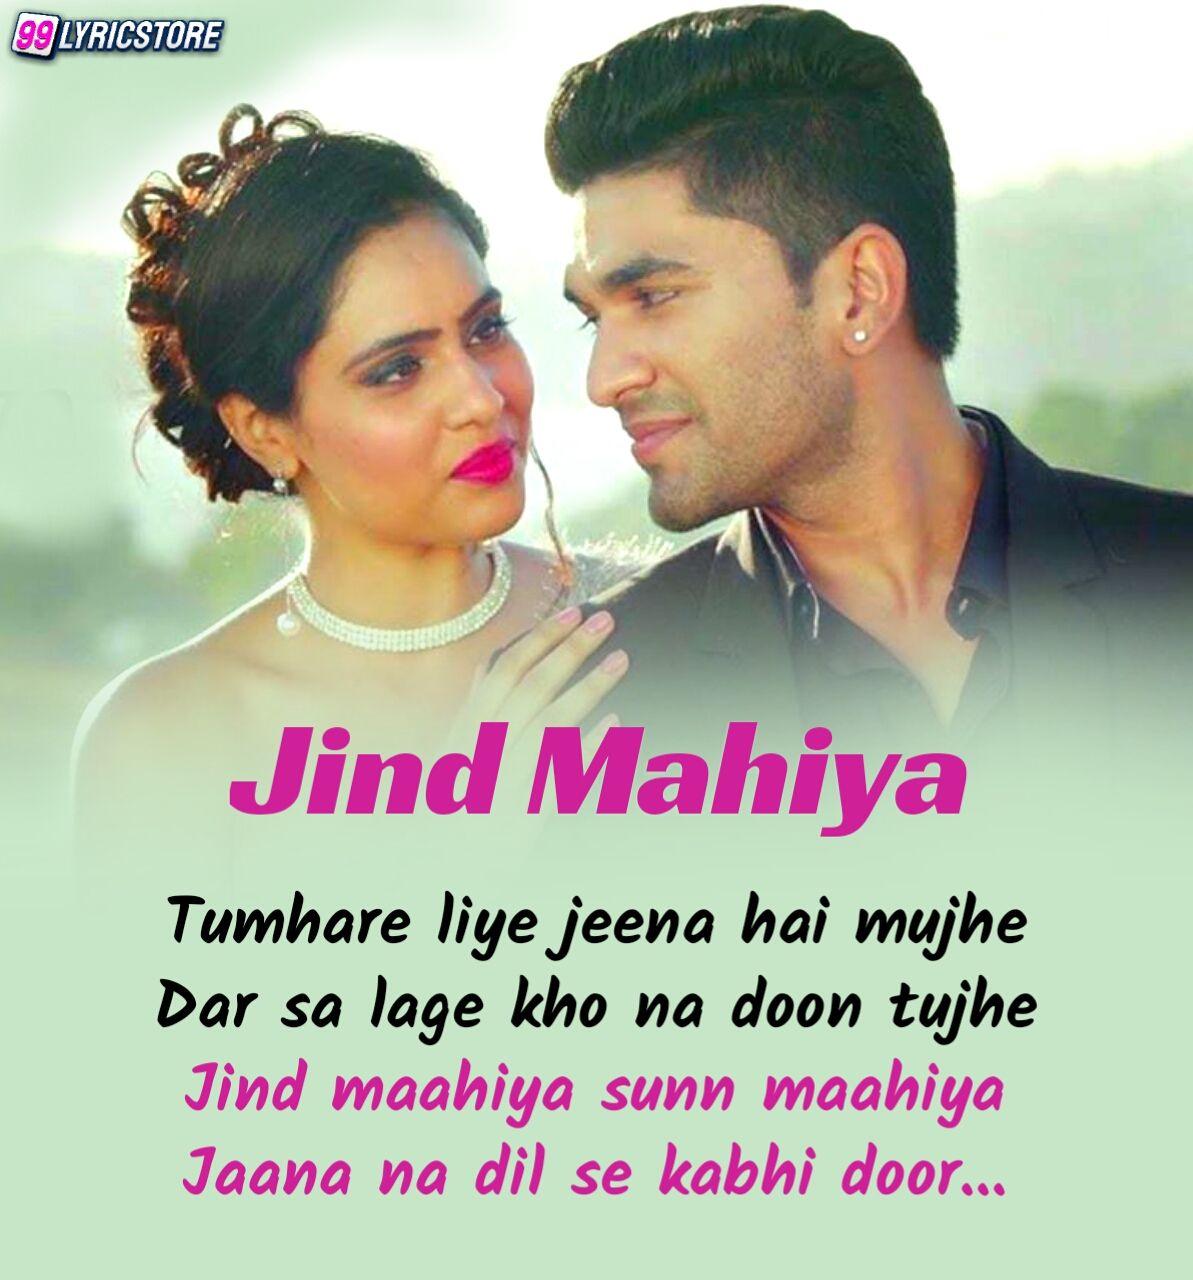 Jind Mahiya Hindi Songs Lyrics sung by Yasser Desai and Palak Muchhal